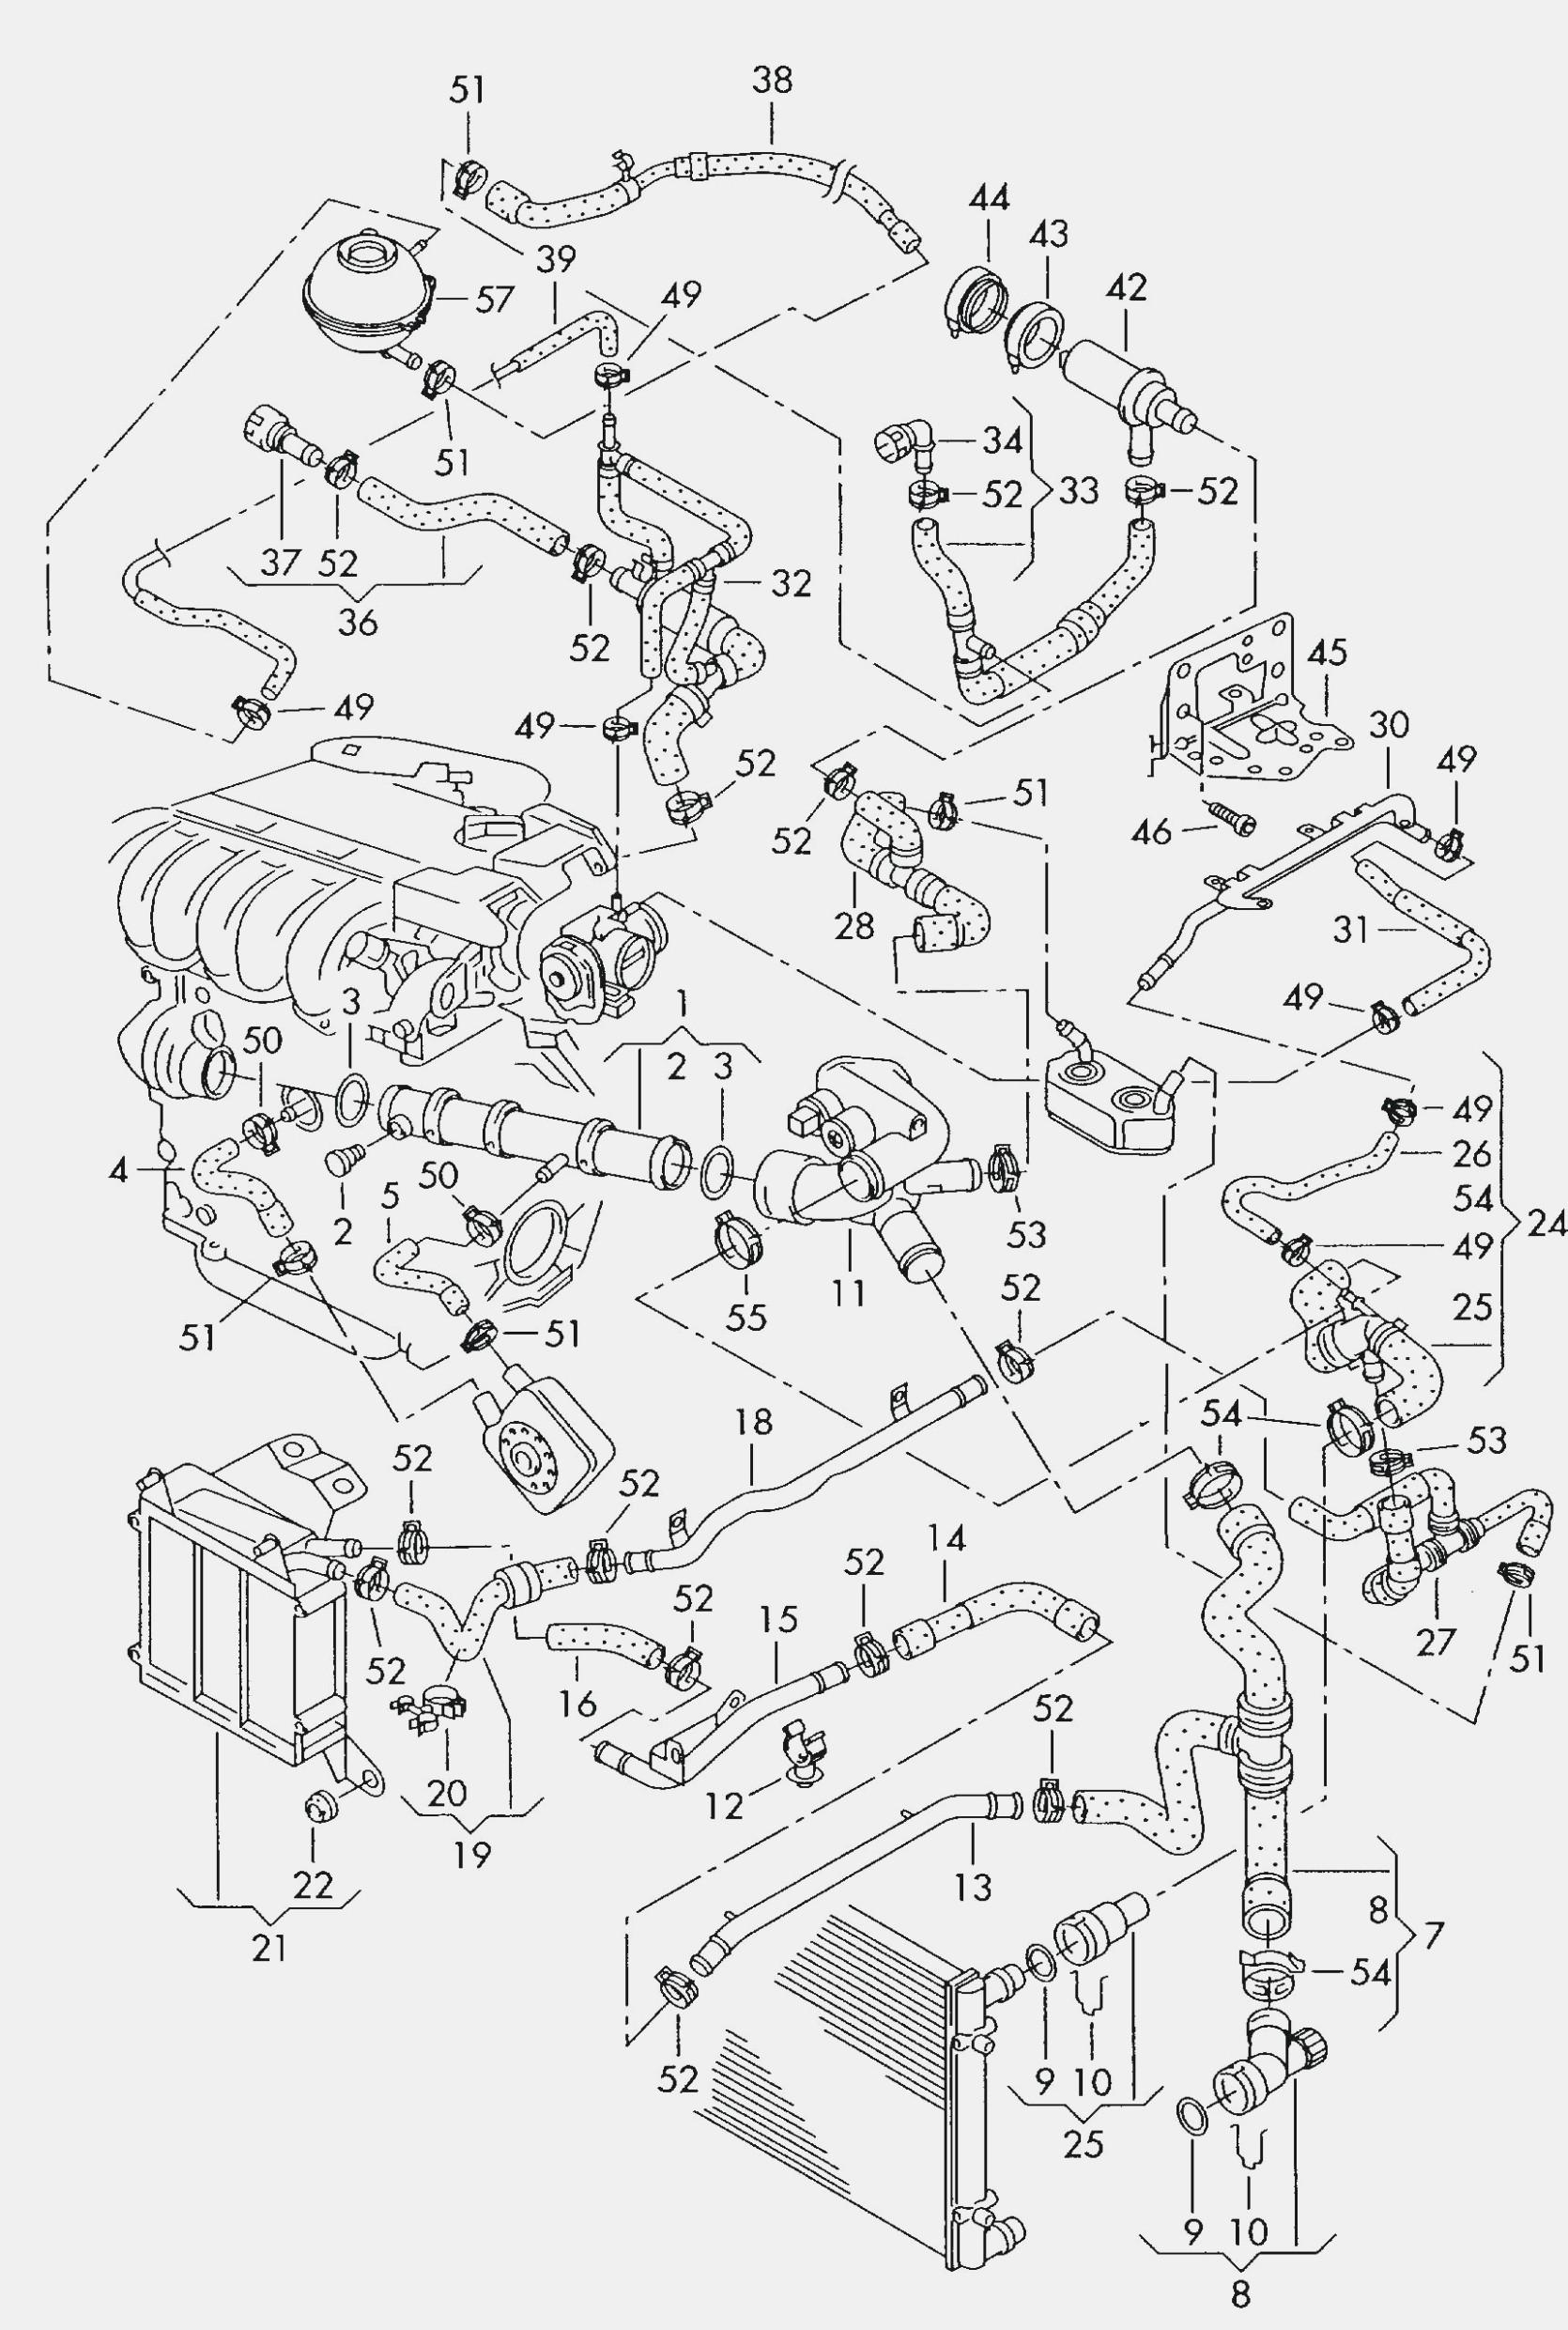 Simple Engine Diagram Wrg 7916] 2 2 Engine Diagram Of Simple Engine Diagram